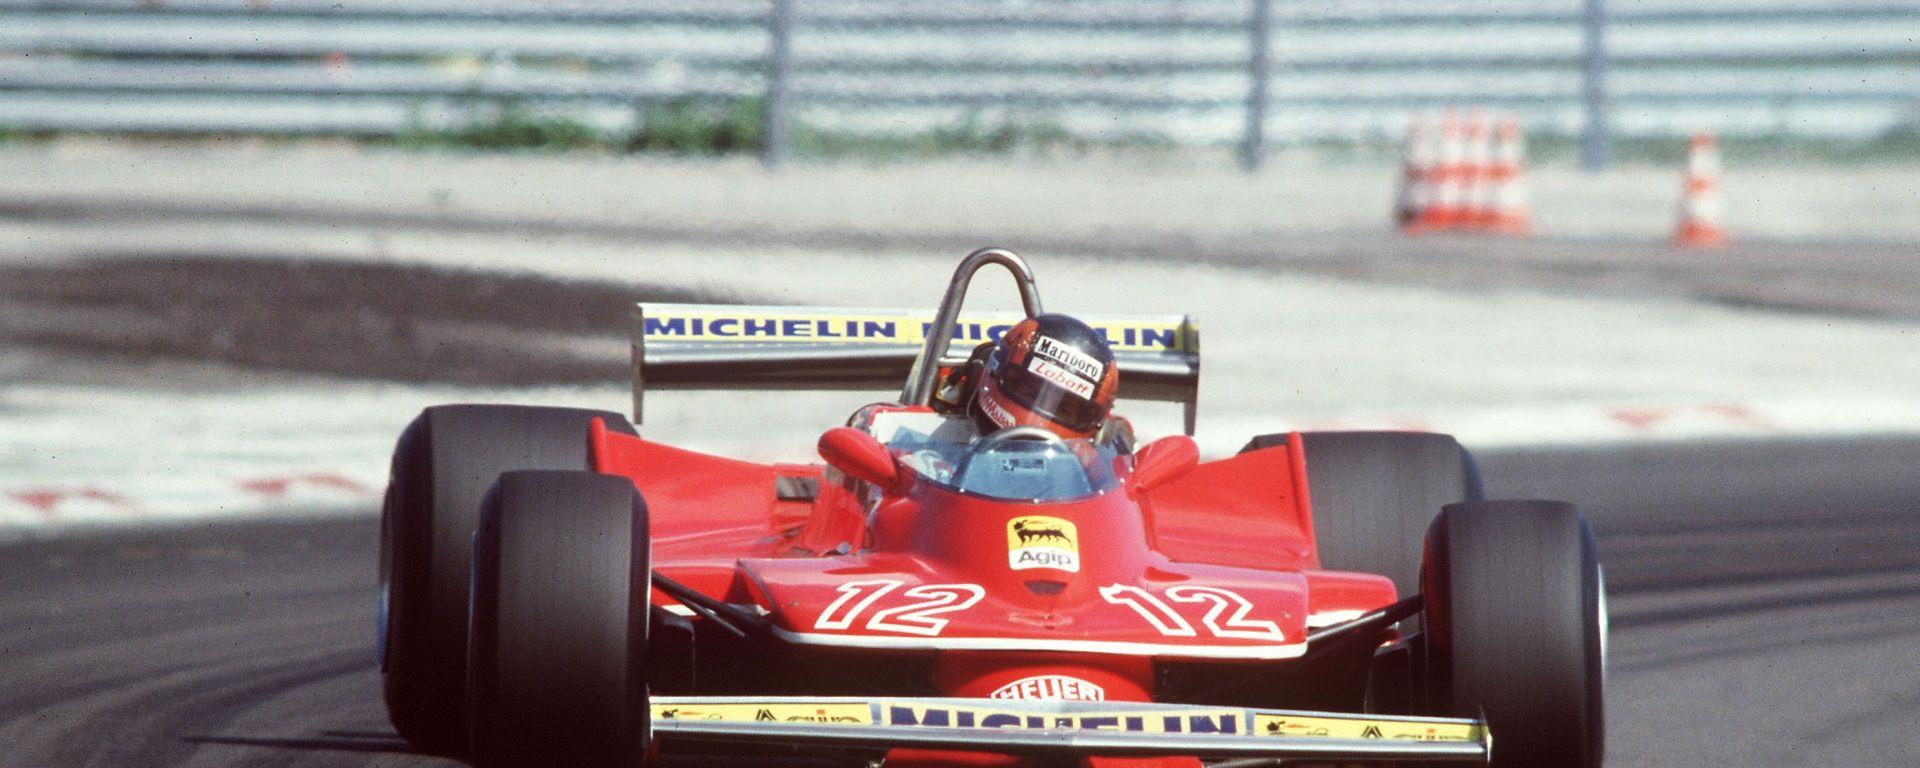 Gilles Villeneuve, un mito in mostra